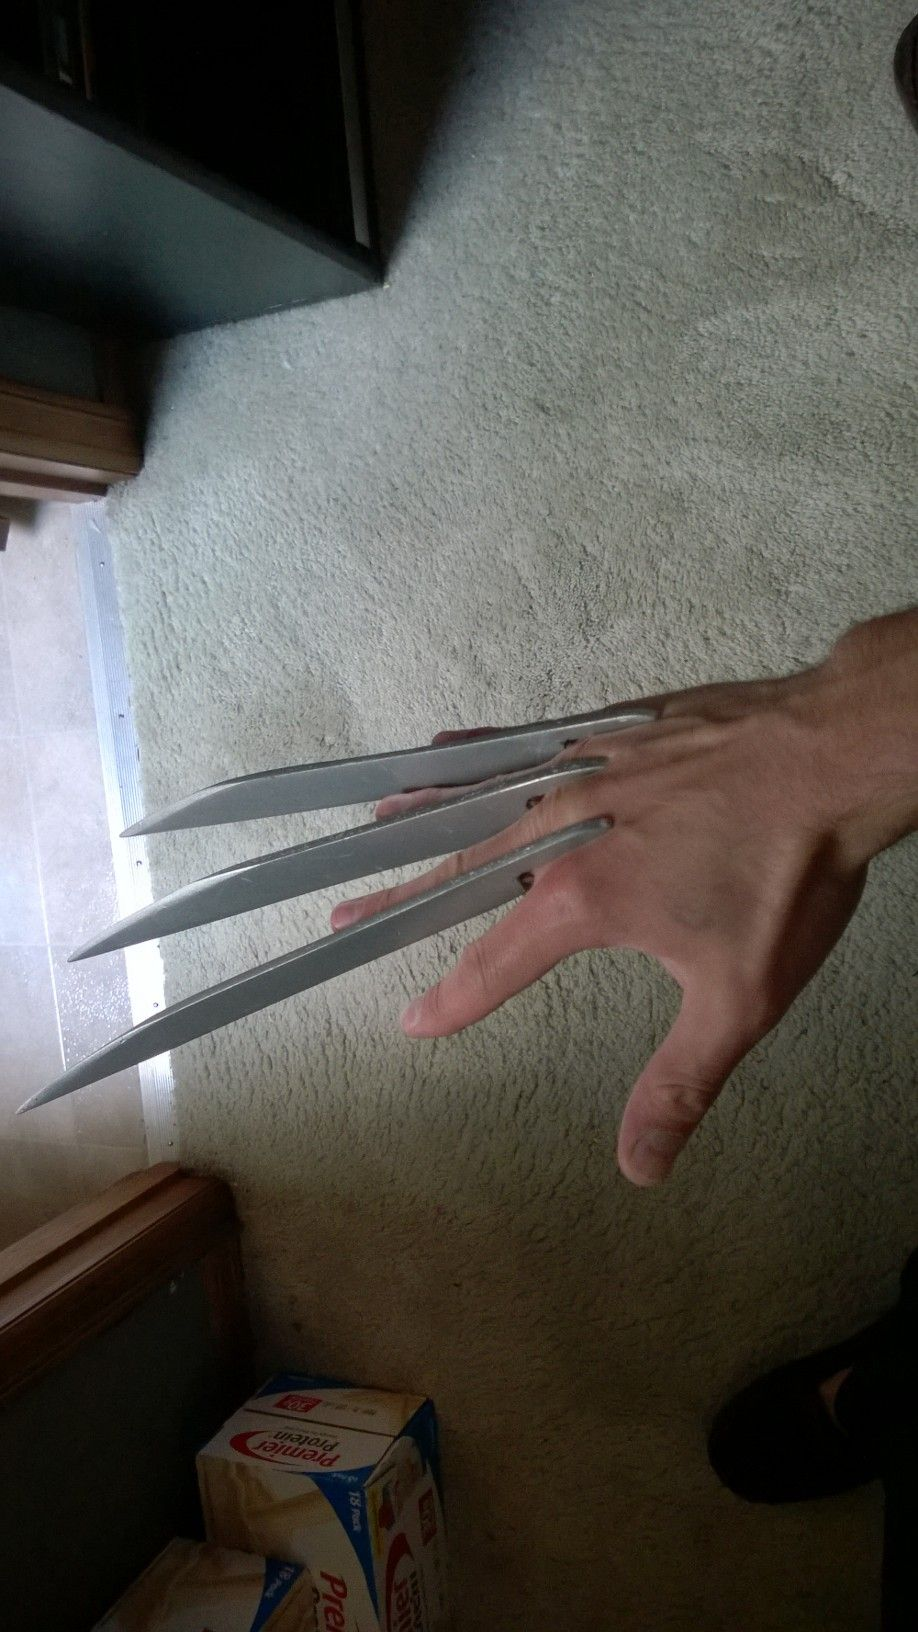 Diy fiberglass wolverine claws cosplay costumes and cosplay tutorial diy fiberglass wolverine claws make solutioingenieria Choice Image